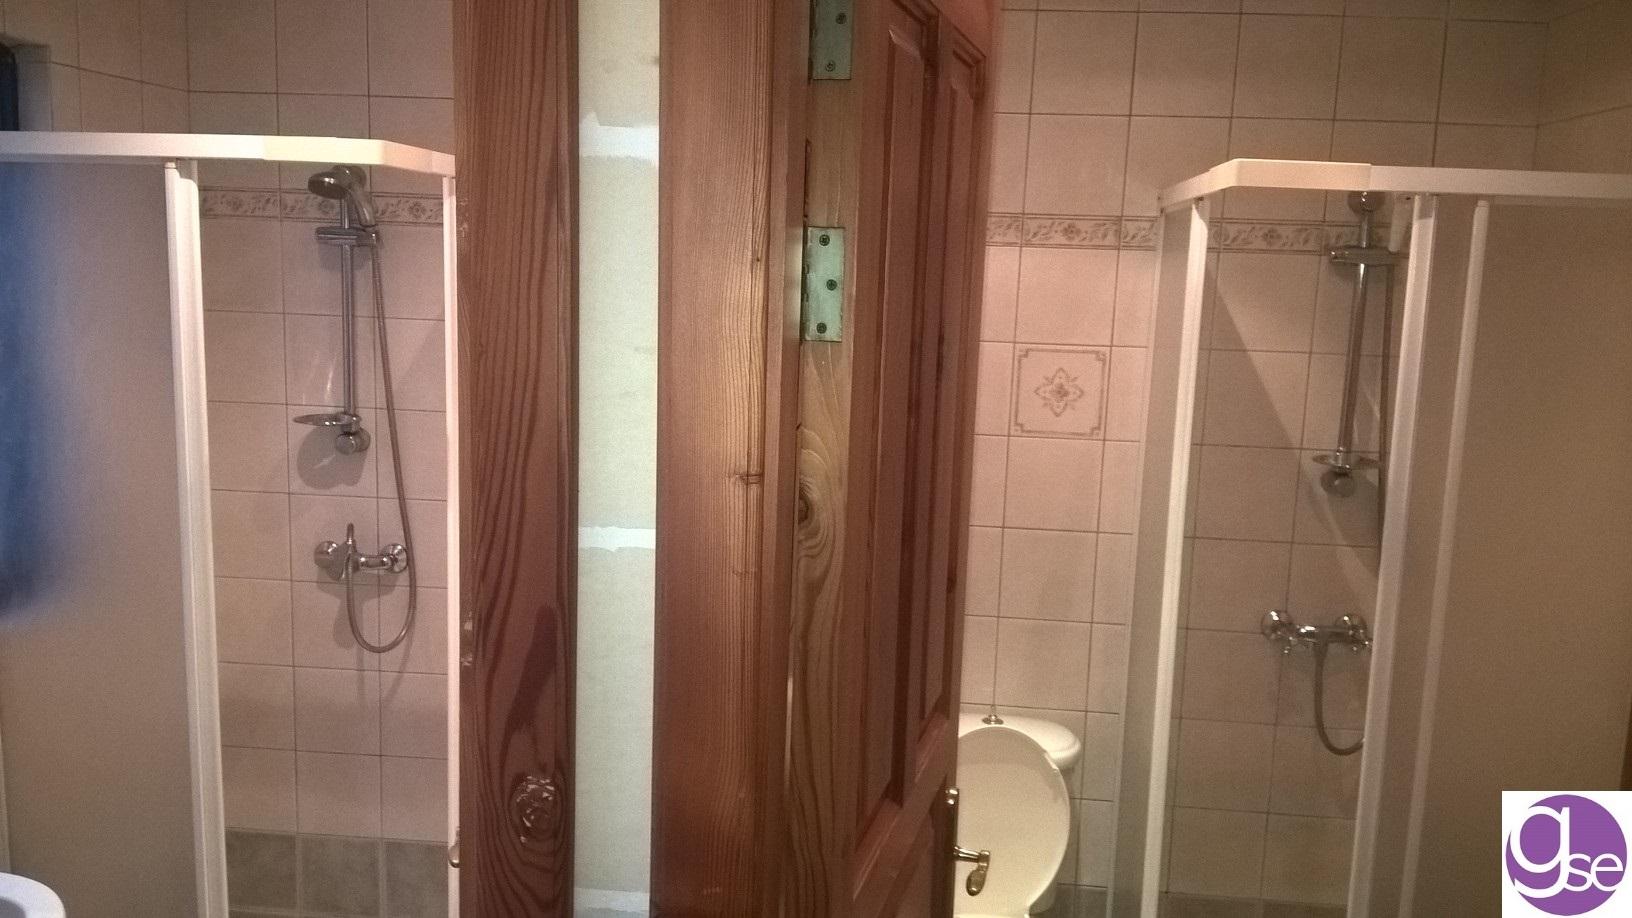 GSE Malta dil okulu Yurdun banyosu 1